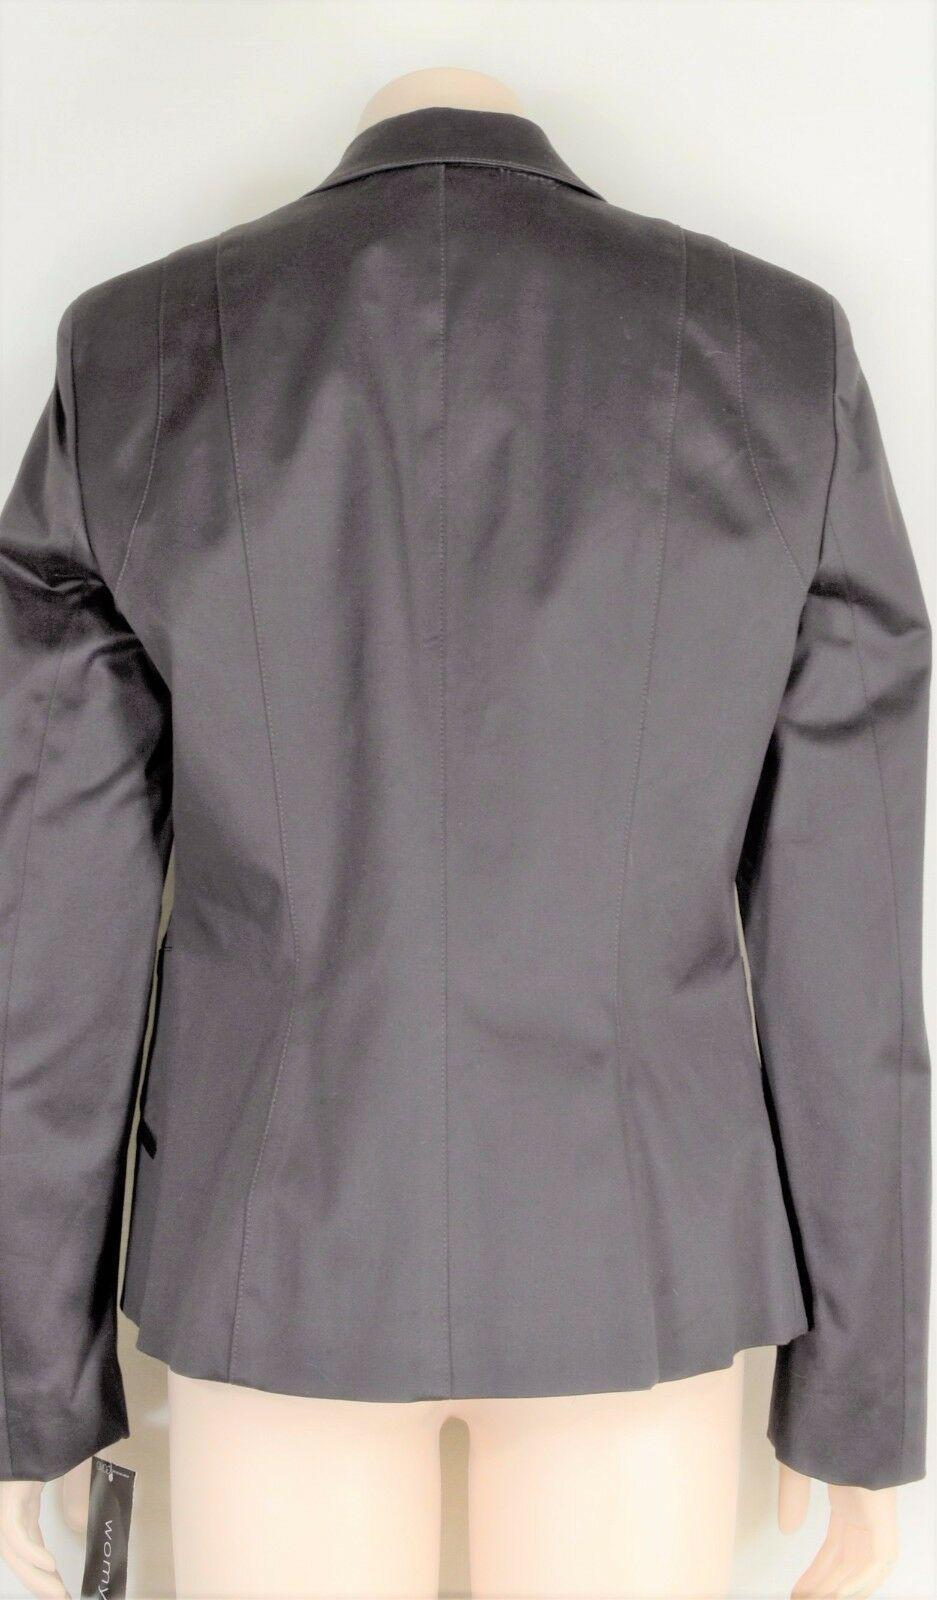 womyn jacket coat NWT SZ 8 dark brown 1-button closure lined NYC USA new image 3